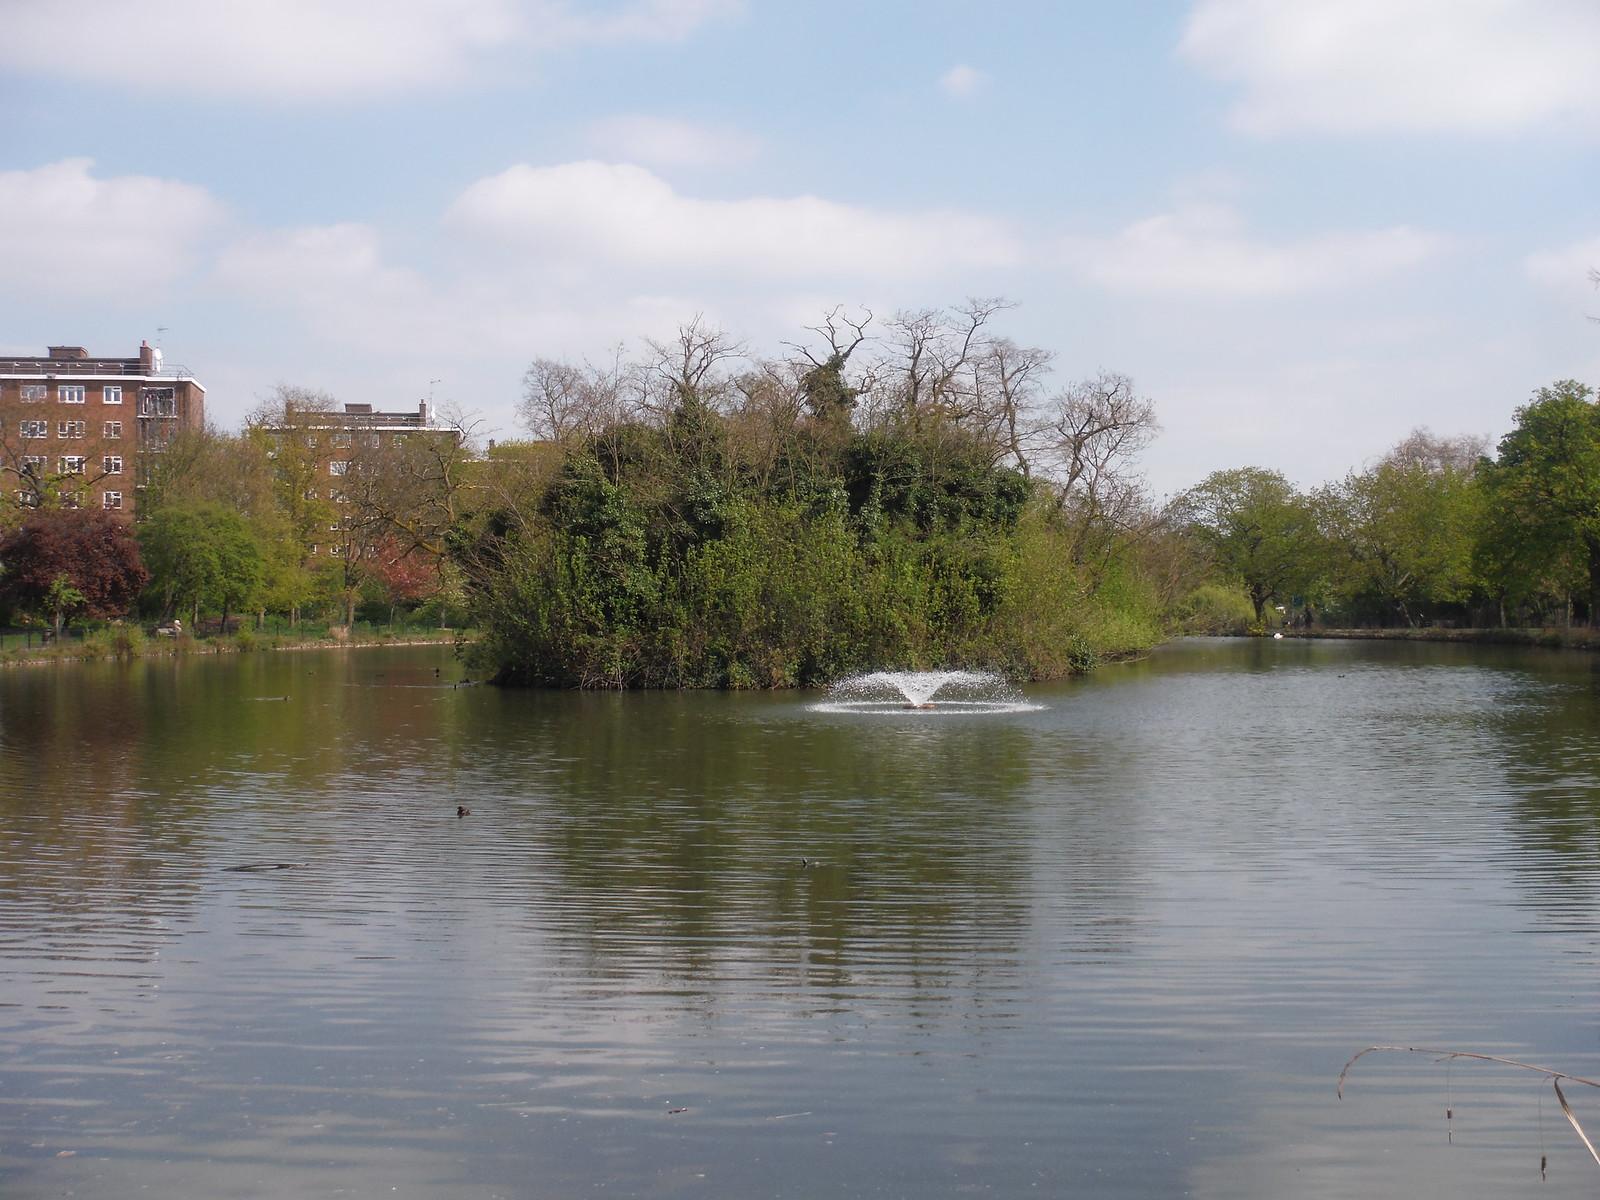 Lake in Clissold Park SWC Short Walk 26 - Woodberry Wetlands (Stoke Newington Reservoirs) [Alternative Ending]